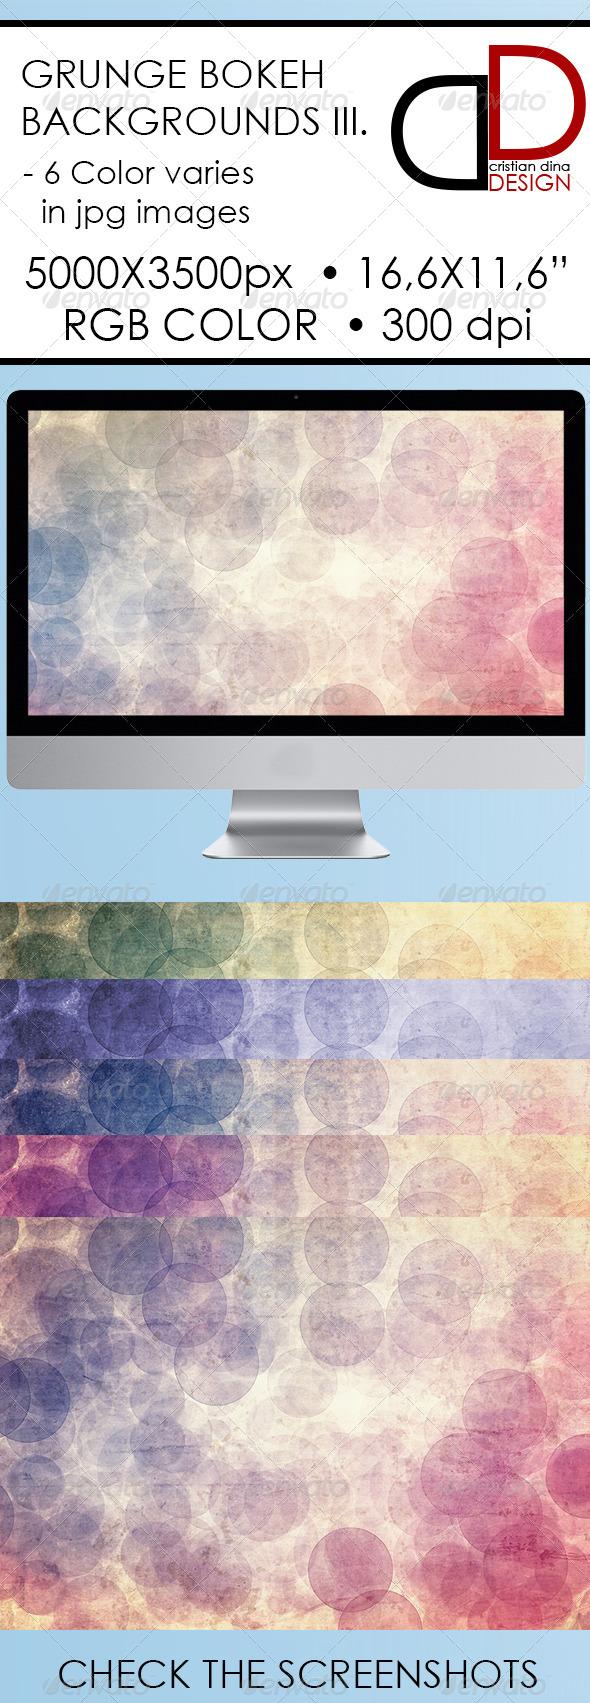 GraphicRiver Abstract Grunge Bokeh Backgrounds III 6320649